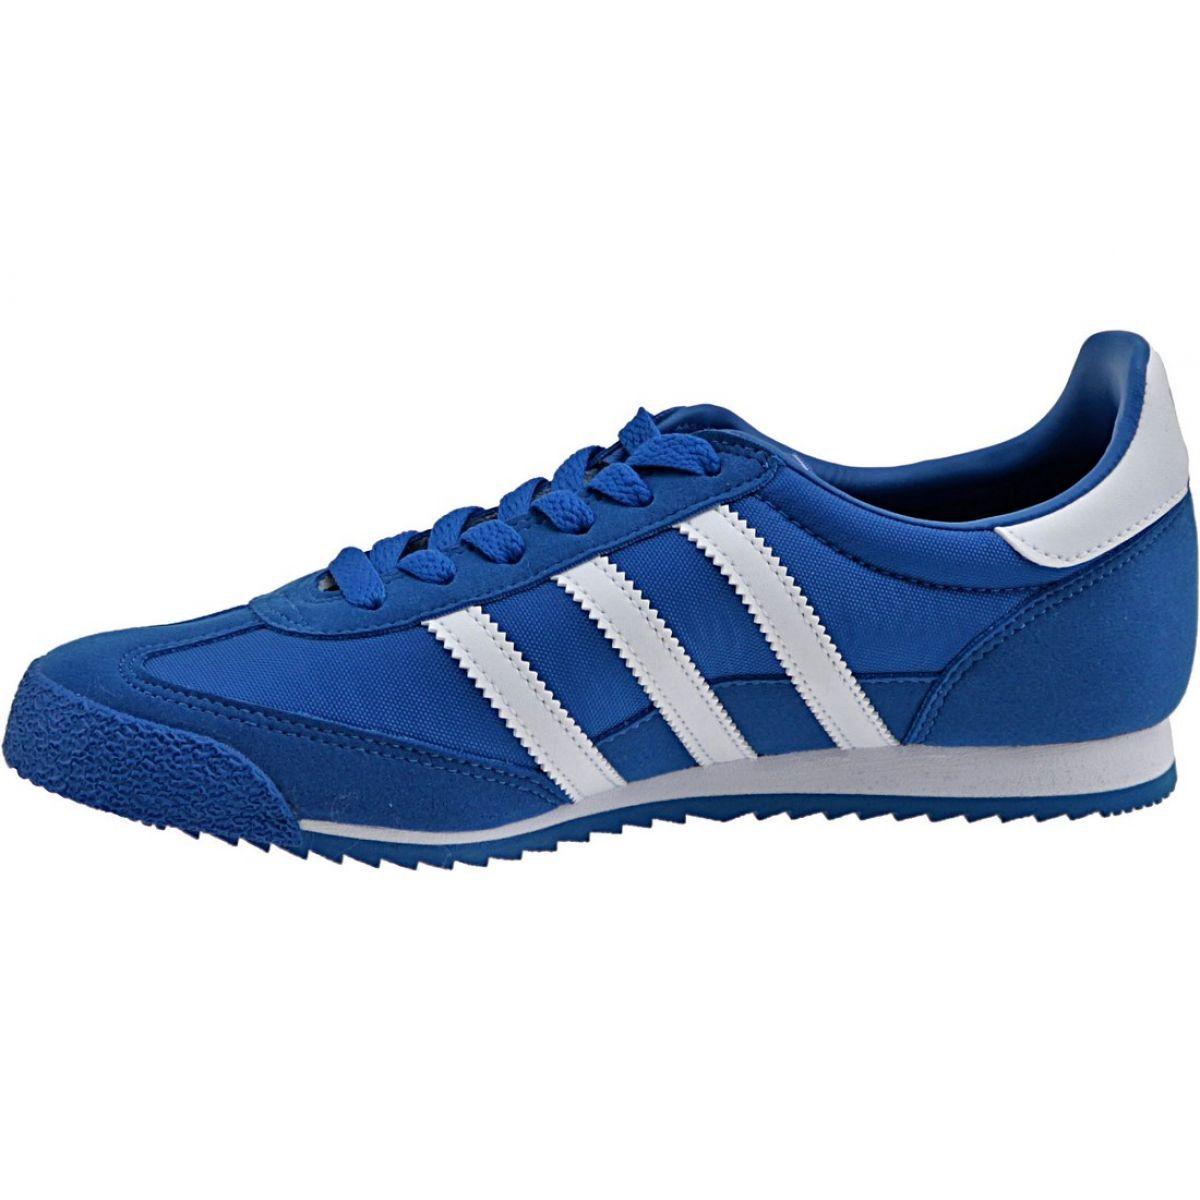 Buty Adidas Dragon Og Jr Bb2486 Niebieskie Adidas Dragon Junior Shoes Blue Shoes